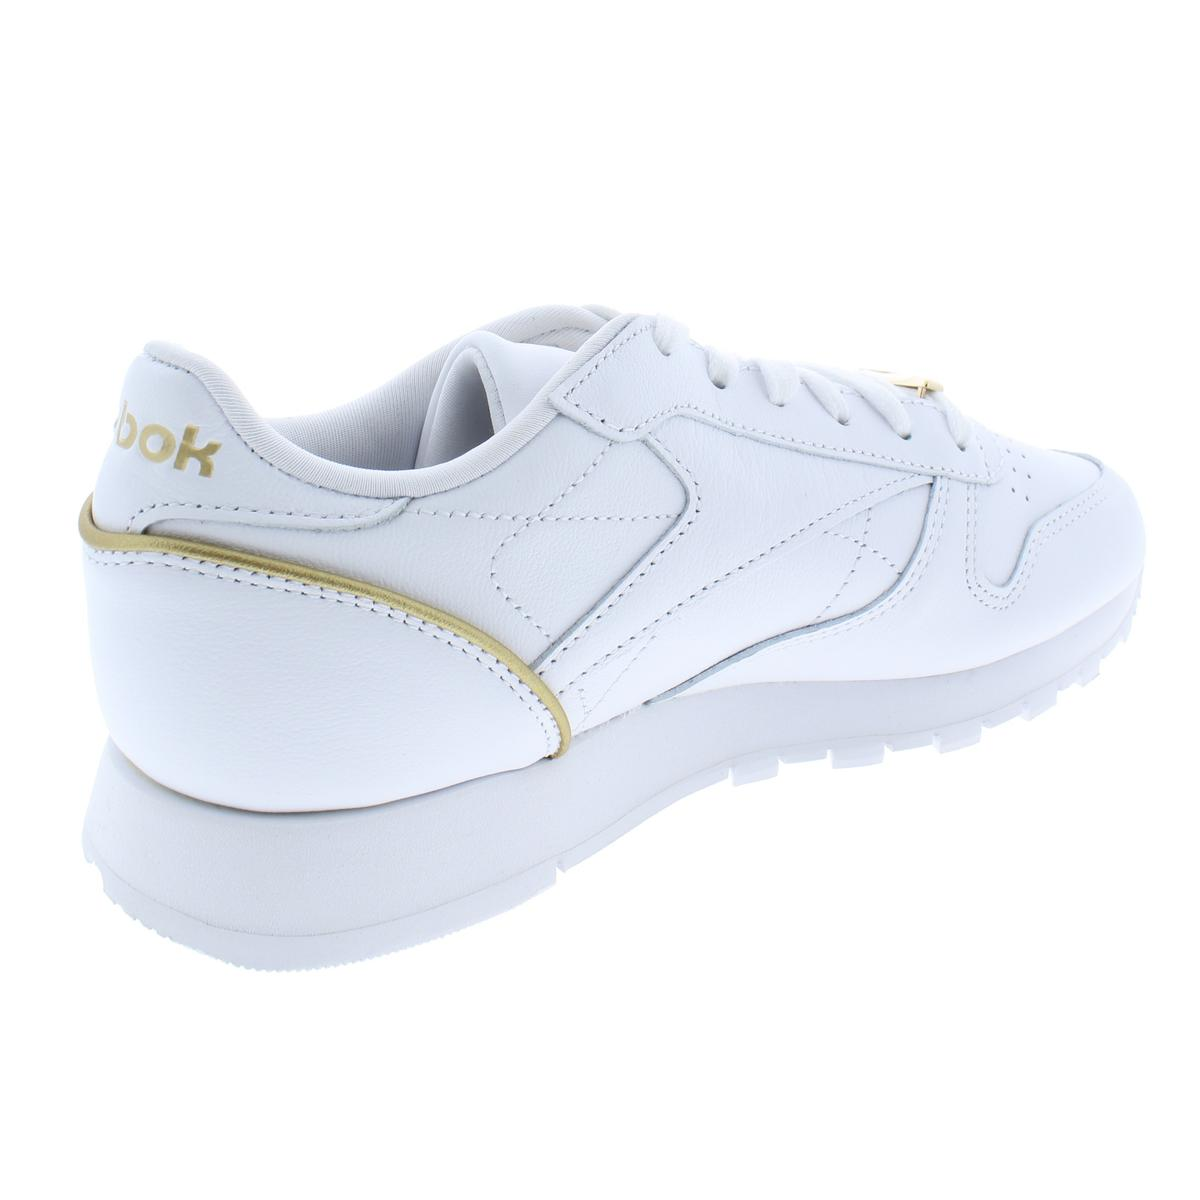 Reebok Womens Classic Leather HW White Sneakers Shoes 7.5 Medium (B,M) BHFO 7618